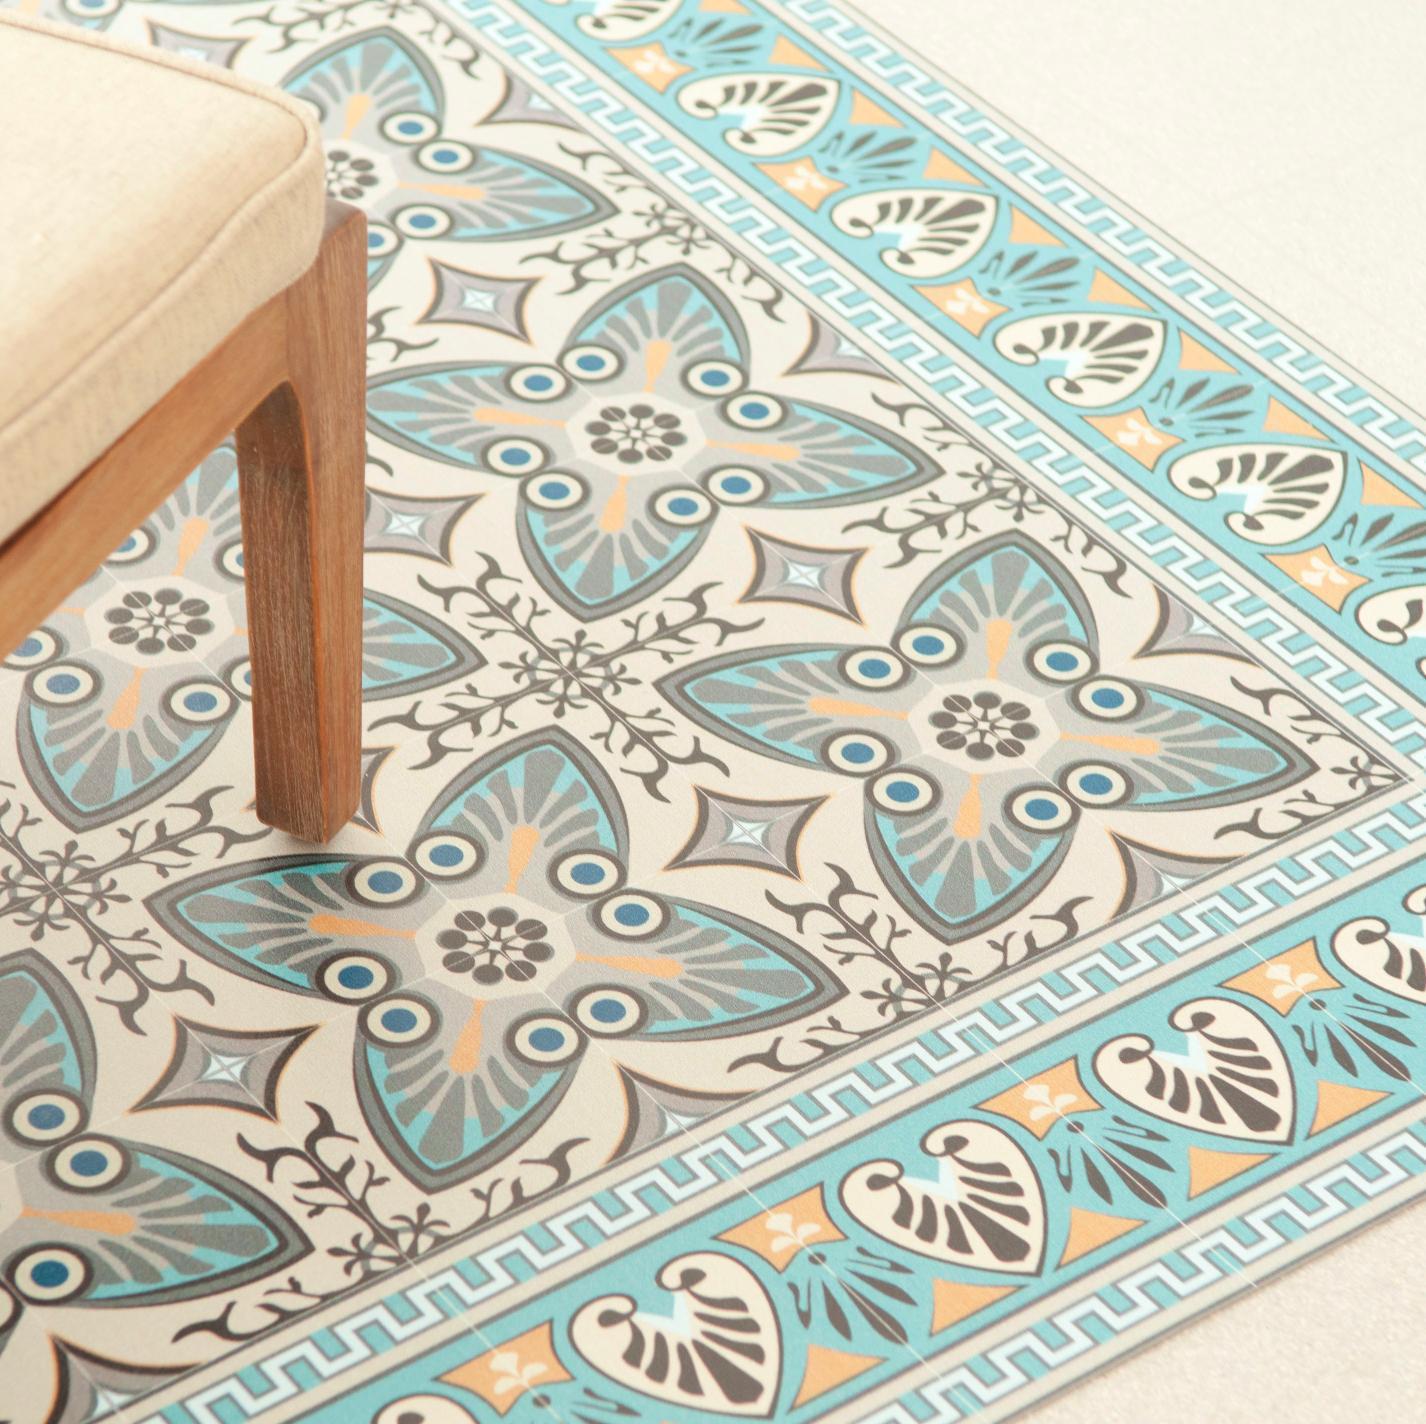 beija flor vinyl bodenmatten. Black Bedroom Furniture Sets. Home Design Ideas